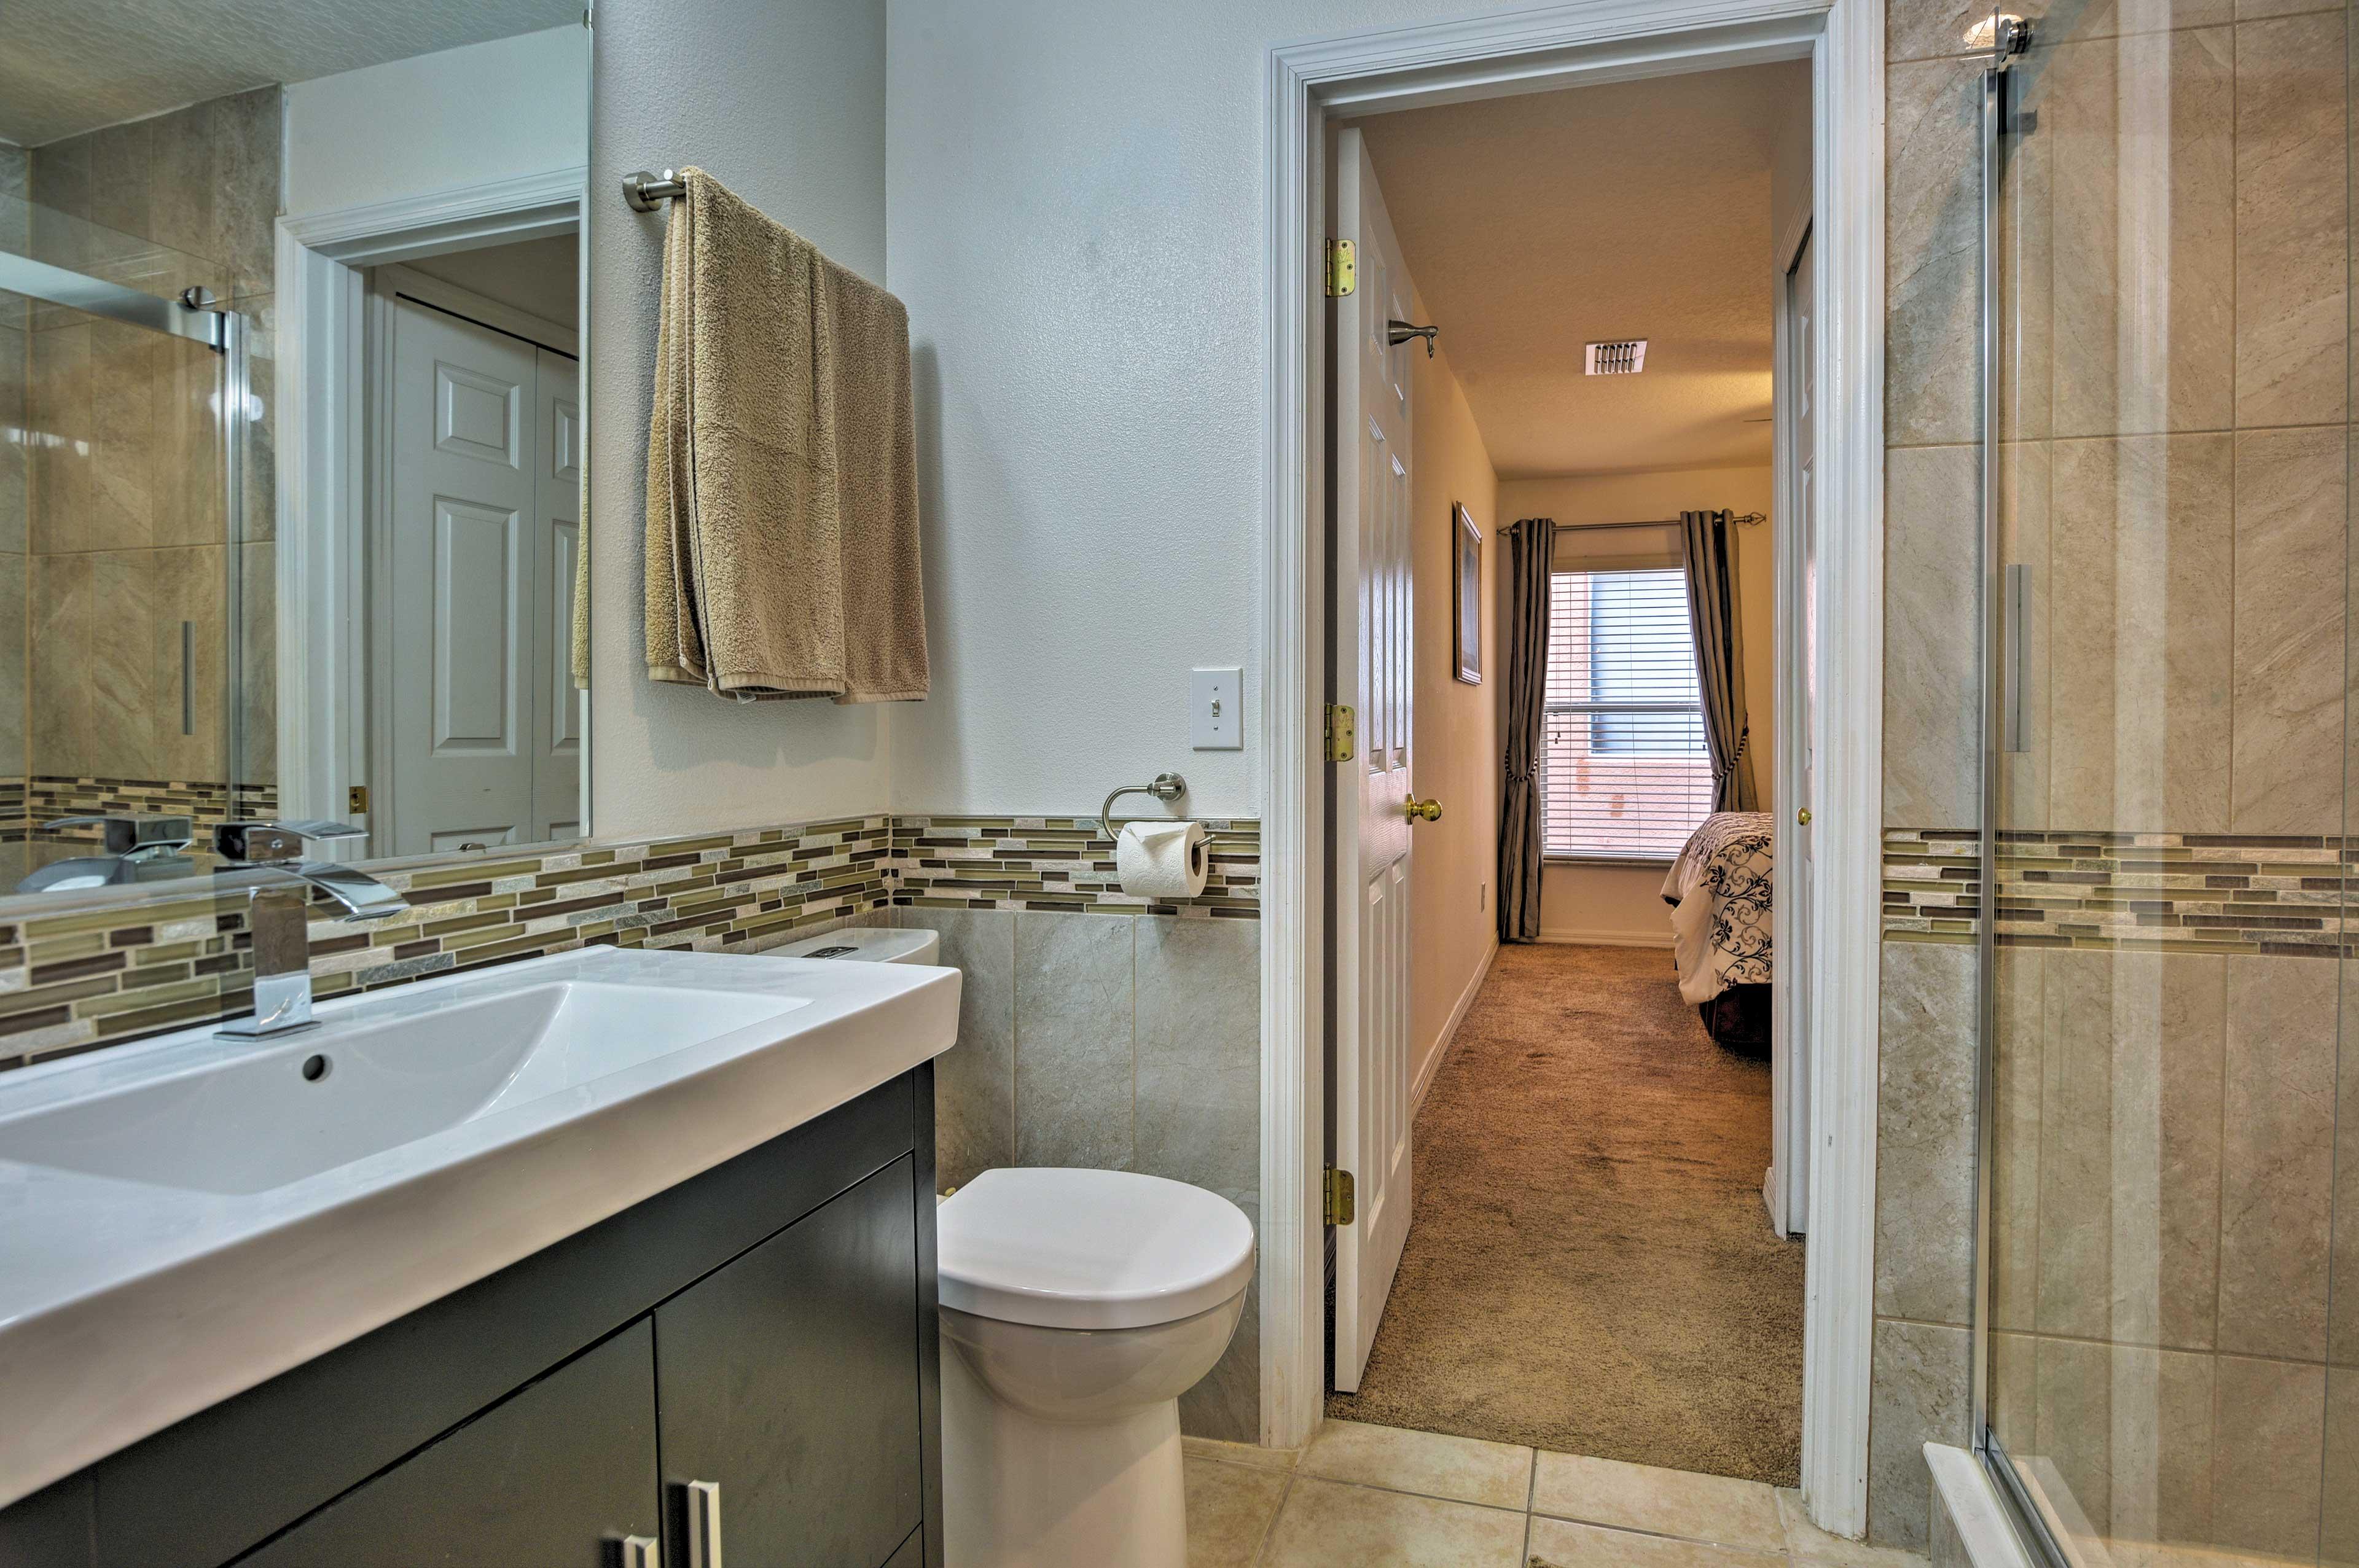 The second bedroom also offers an en-suite bathroom.